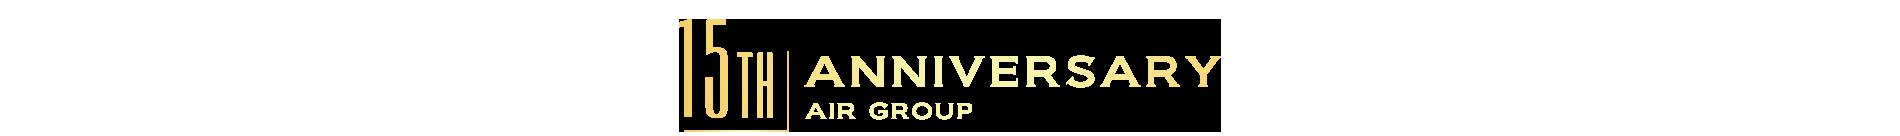 AIR GROUP設立15周年記念サイト